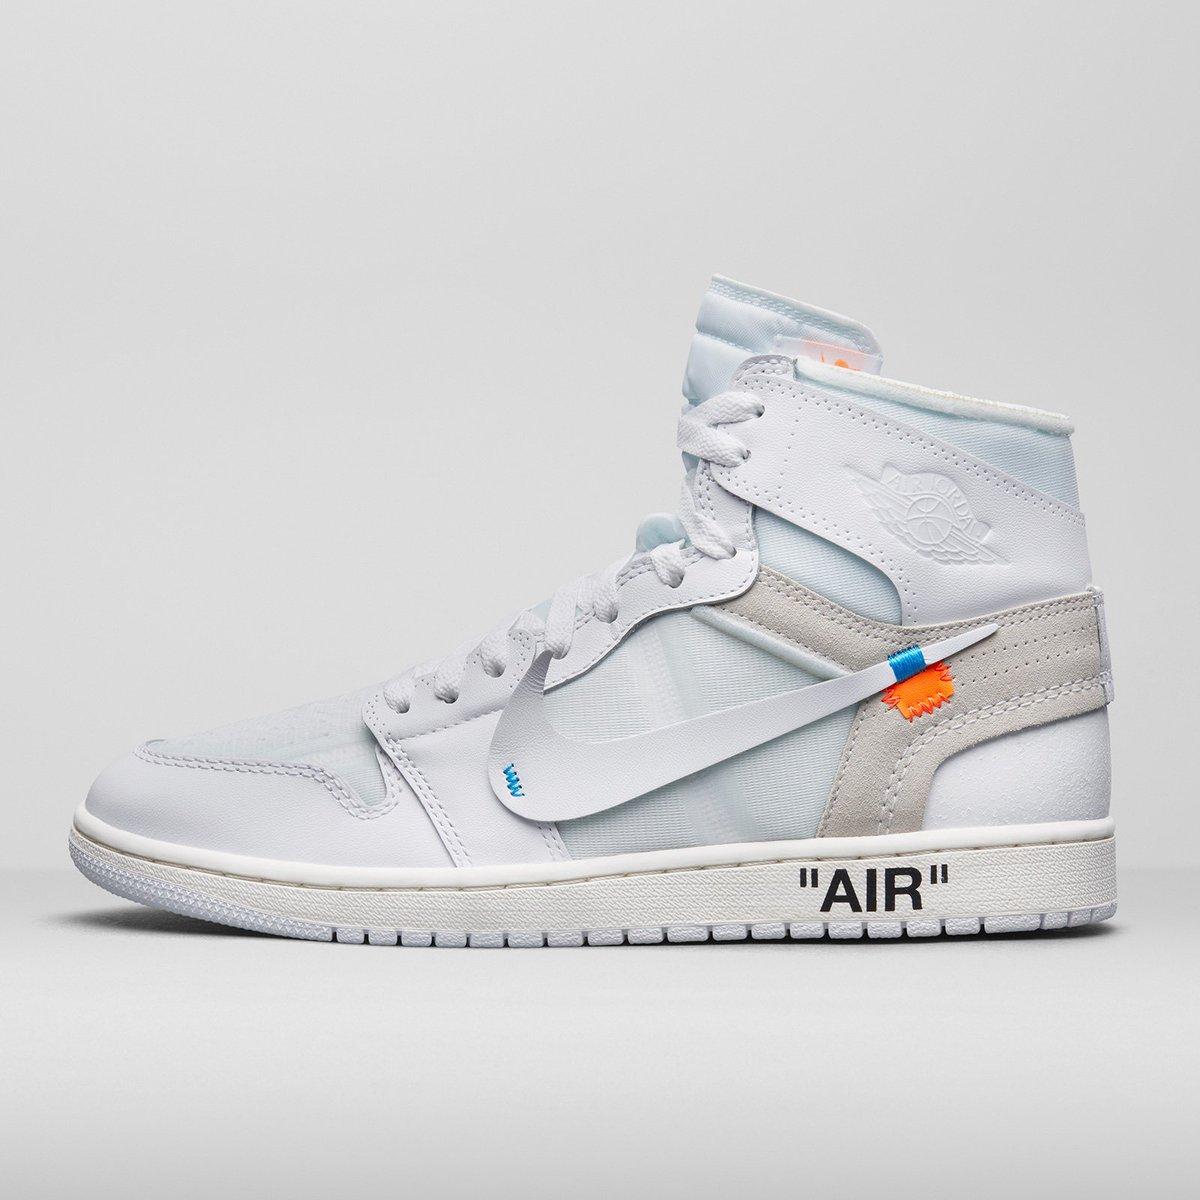 60 signature Air Jordan 1s were